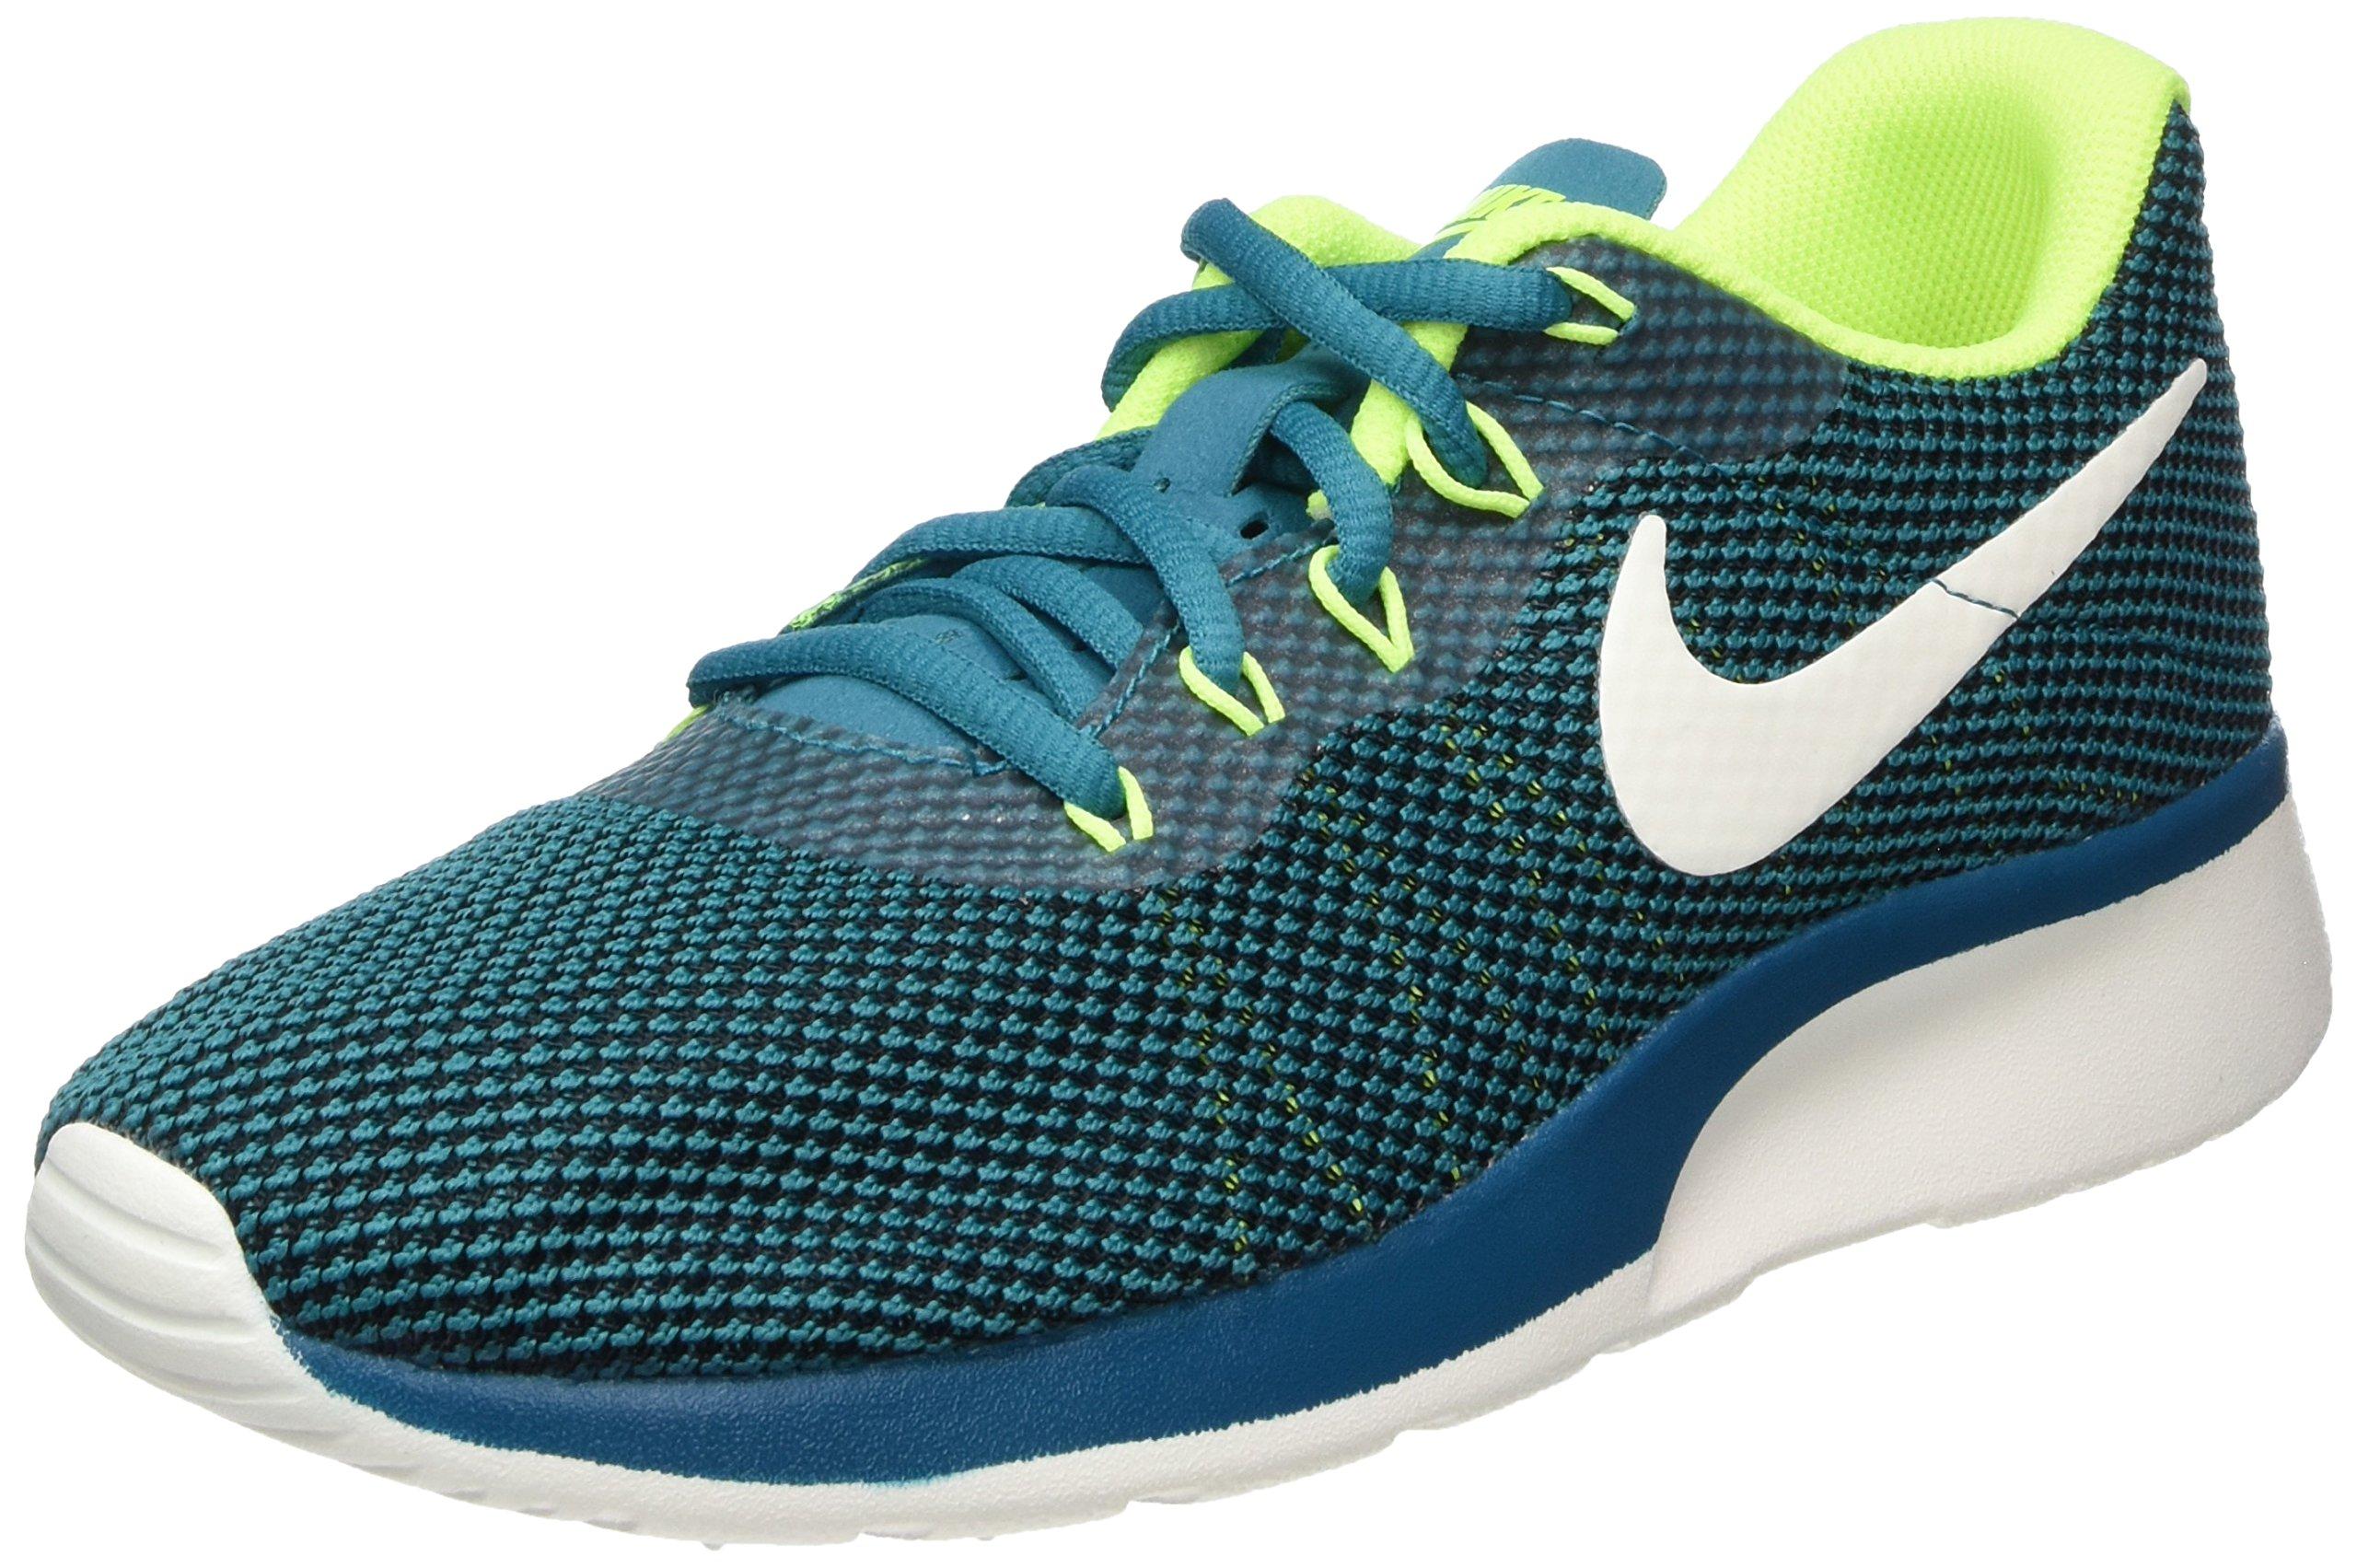 9b2709d68cc Galleon - Nike Men s Tanjun Racer Running Shoes (10 D(M) US ...